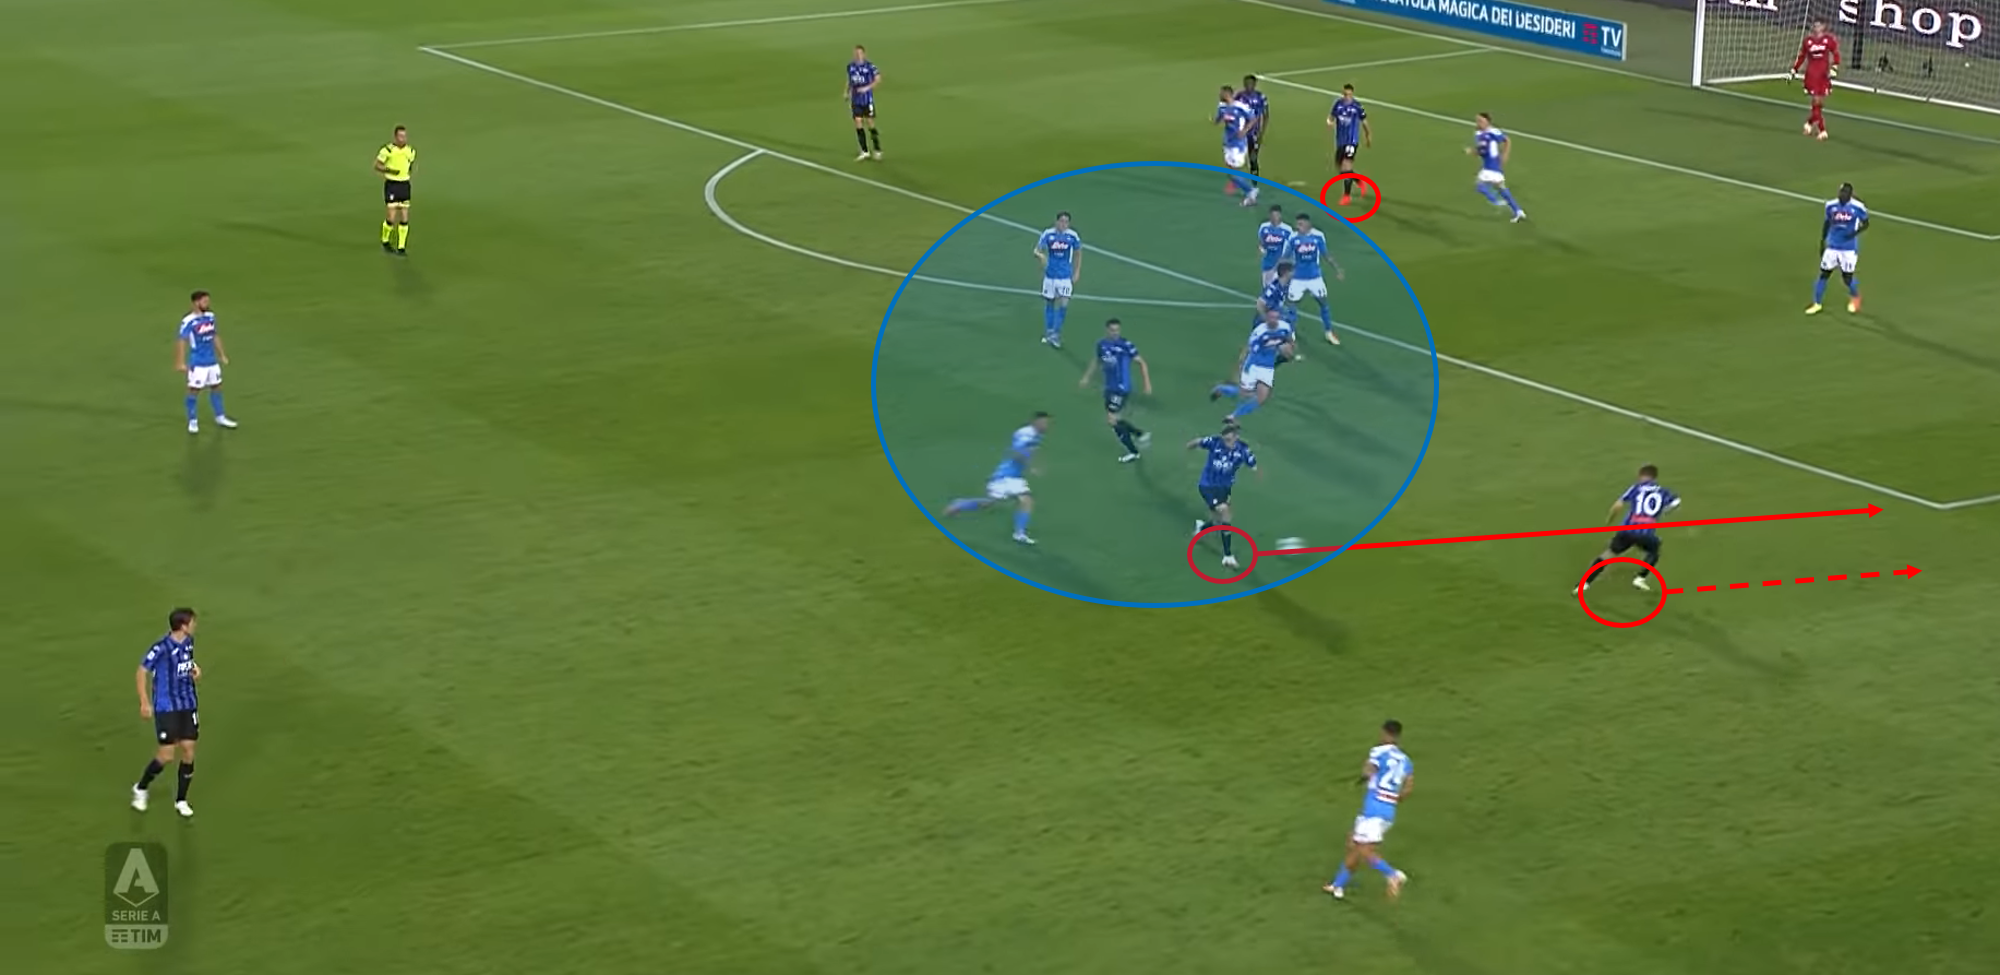 Serie A 2019/20: Atalanta vs Napoli – tactical analysis - tactics